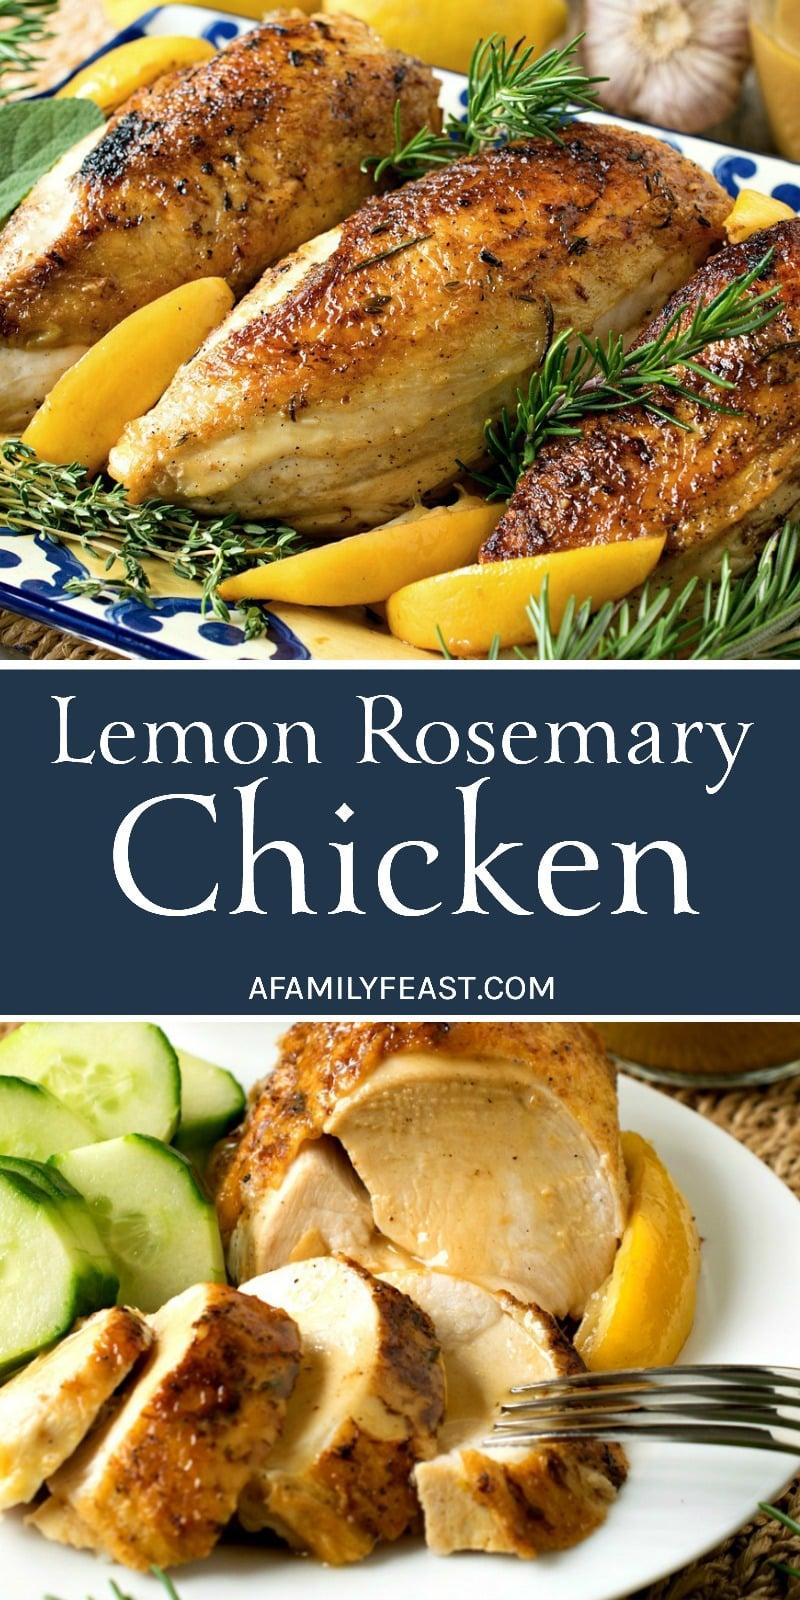 Lemon Rosemary Chicken